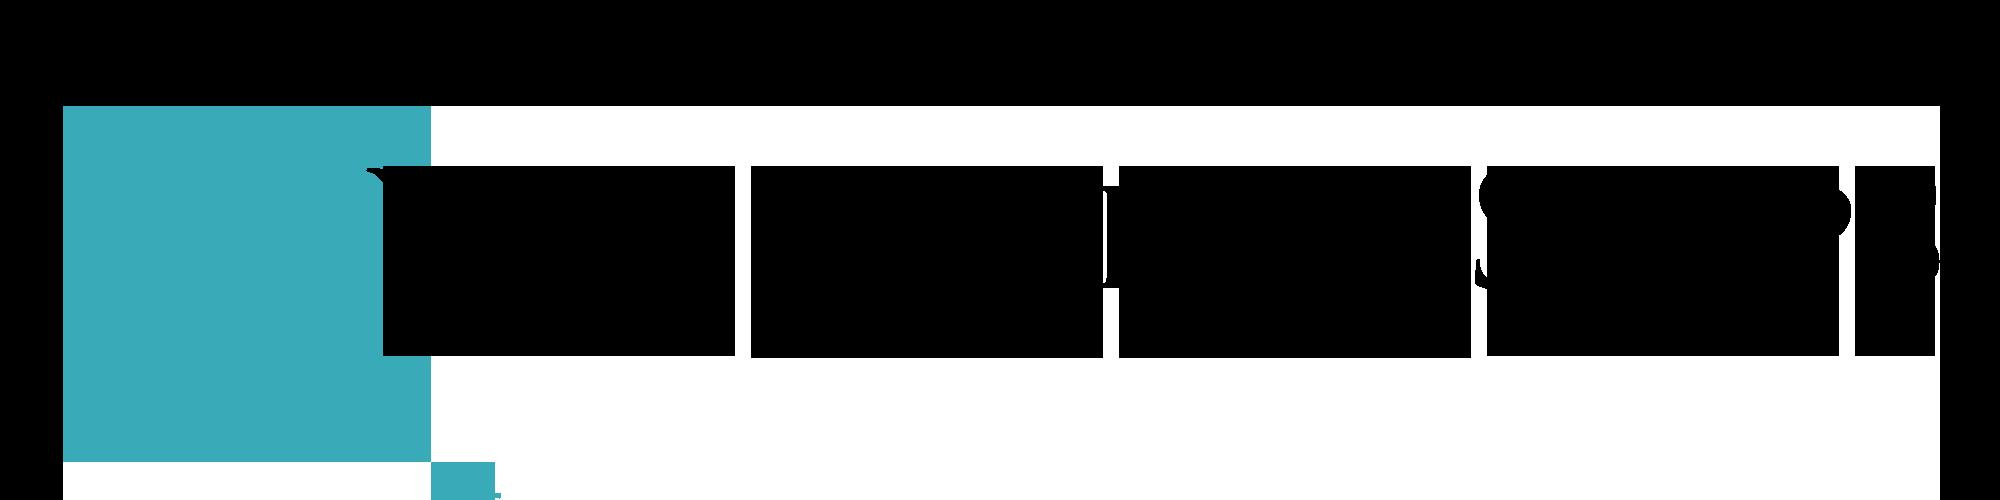 YourNextSteps logo.png